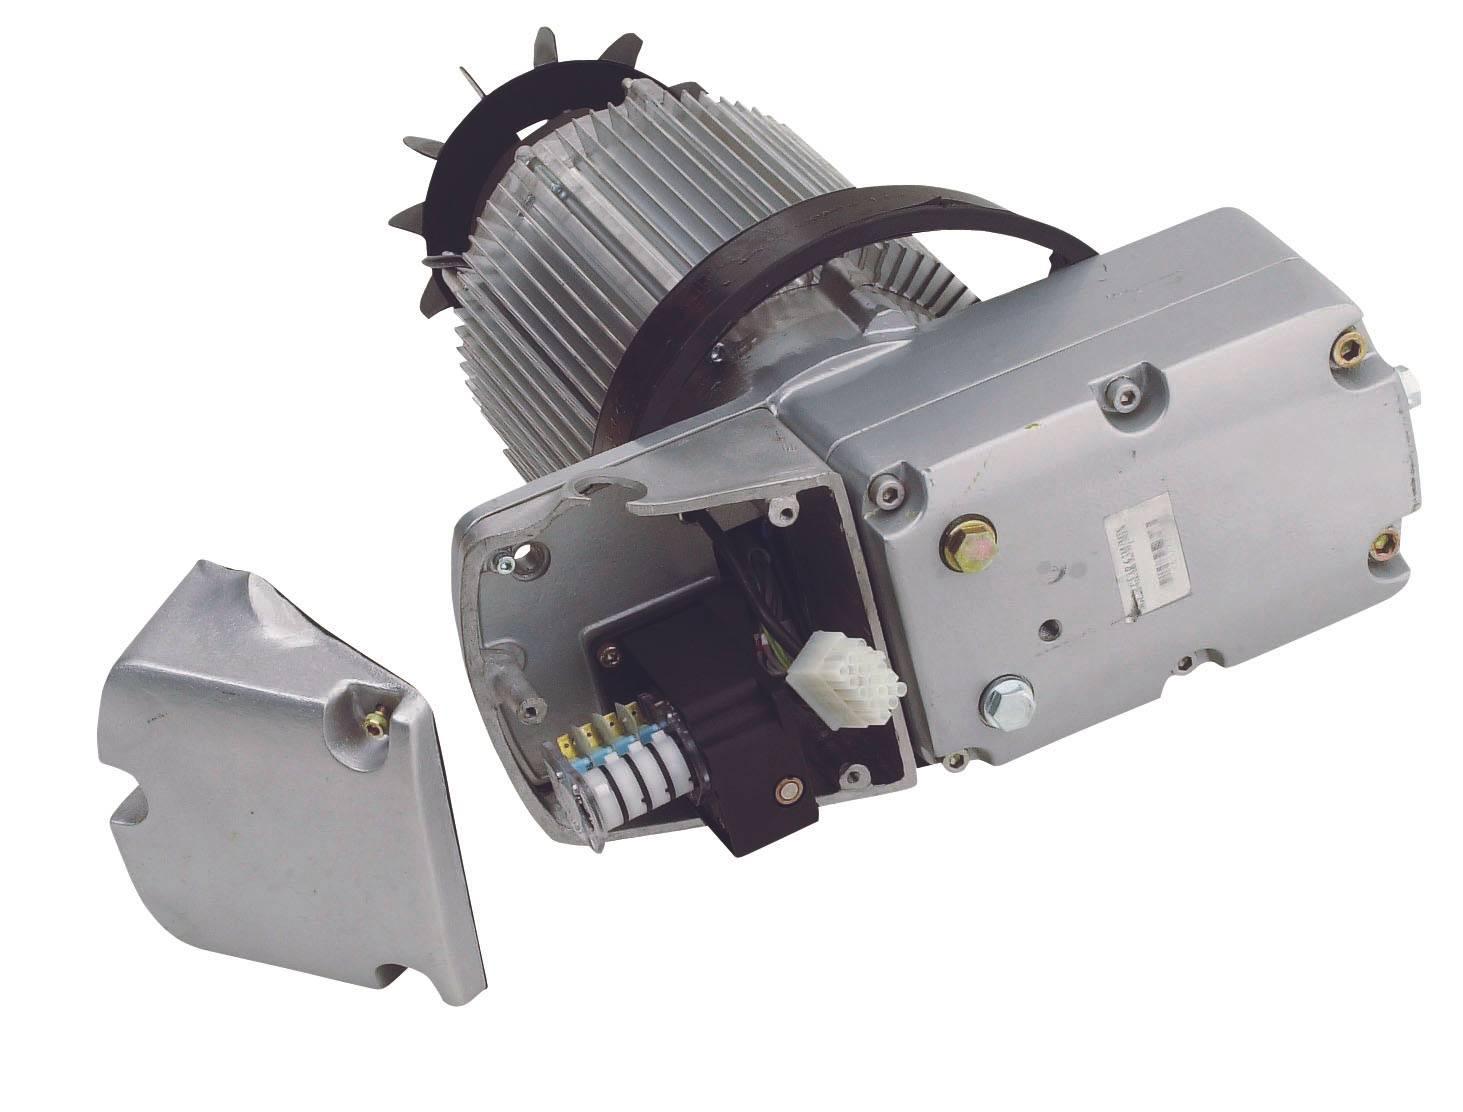 EUROBLOC VT Hoisting motor